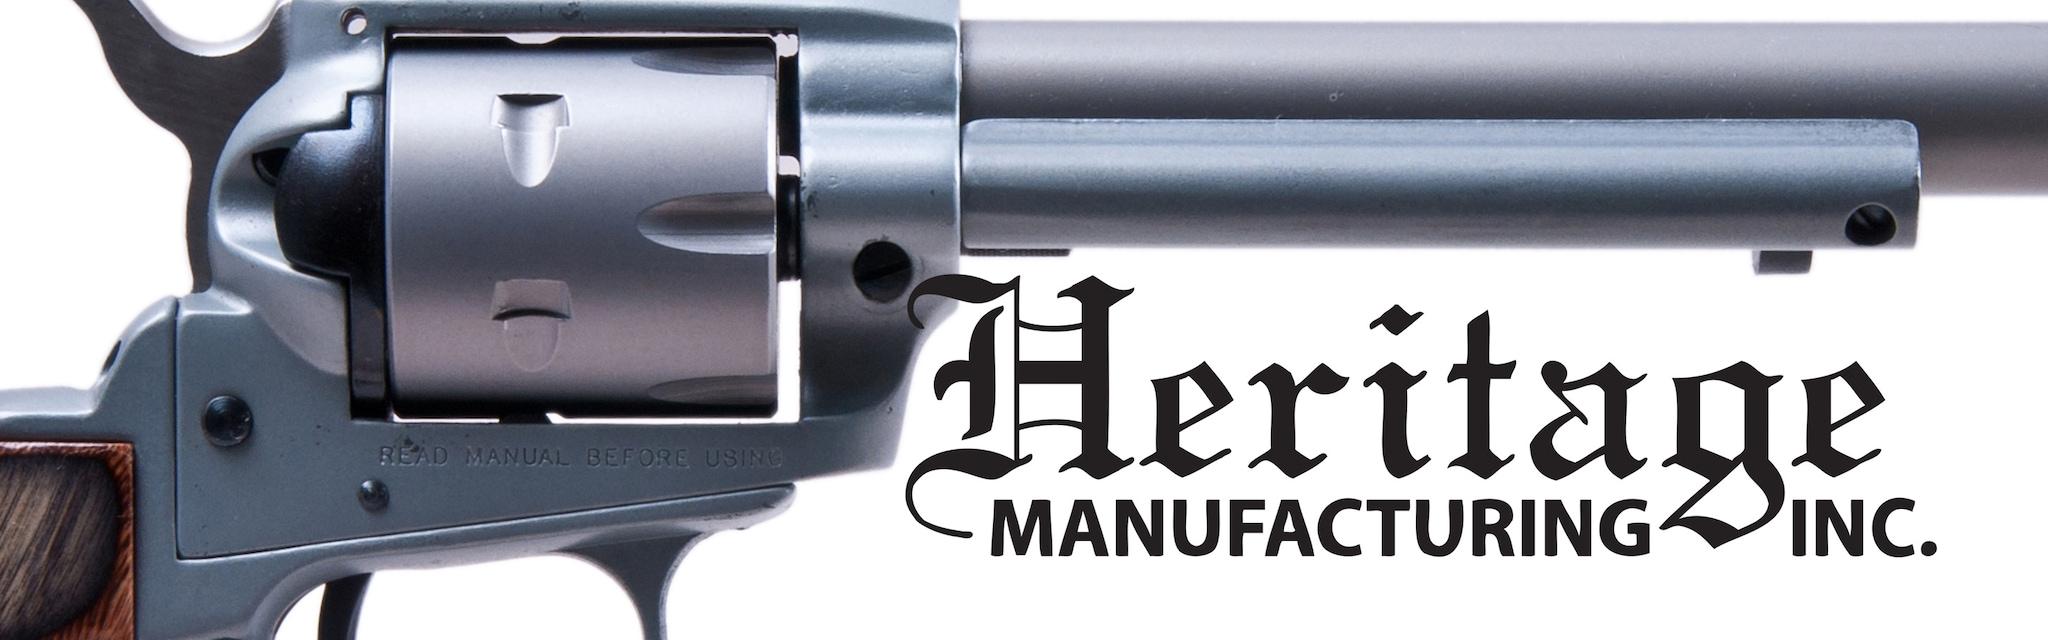 Heritage Manufacturing Inc brand image